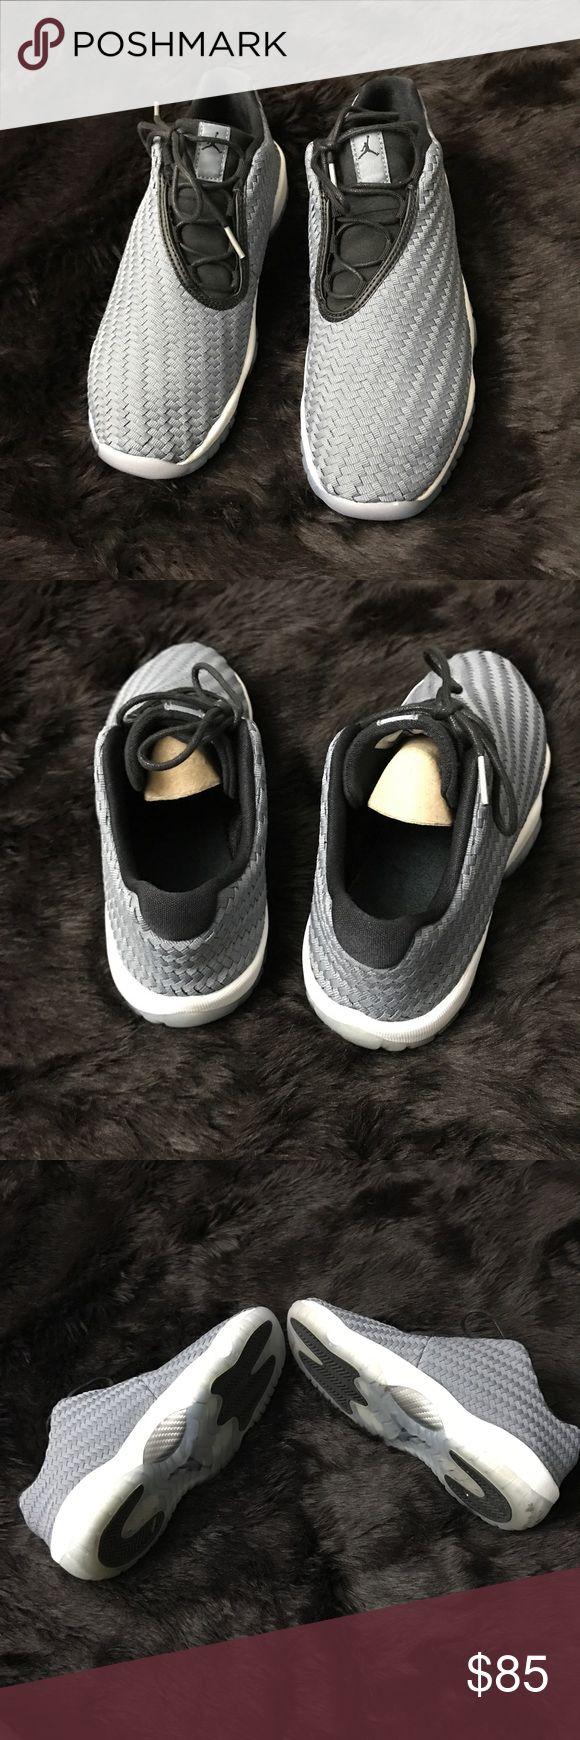 ✨Jordan Future Low 6Y✨ Like new! Worn once 100% authentic Jordan Shoes Sneakers